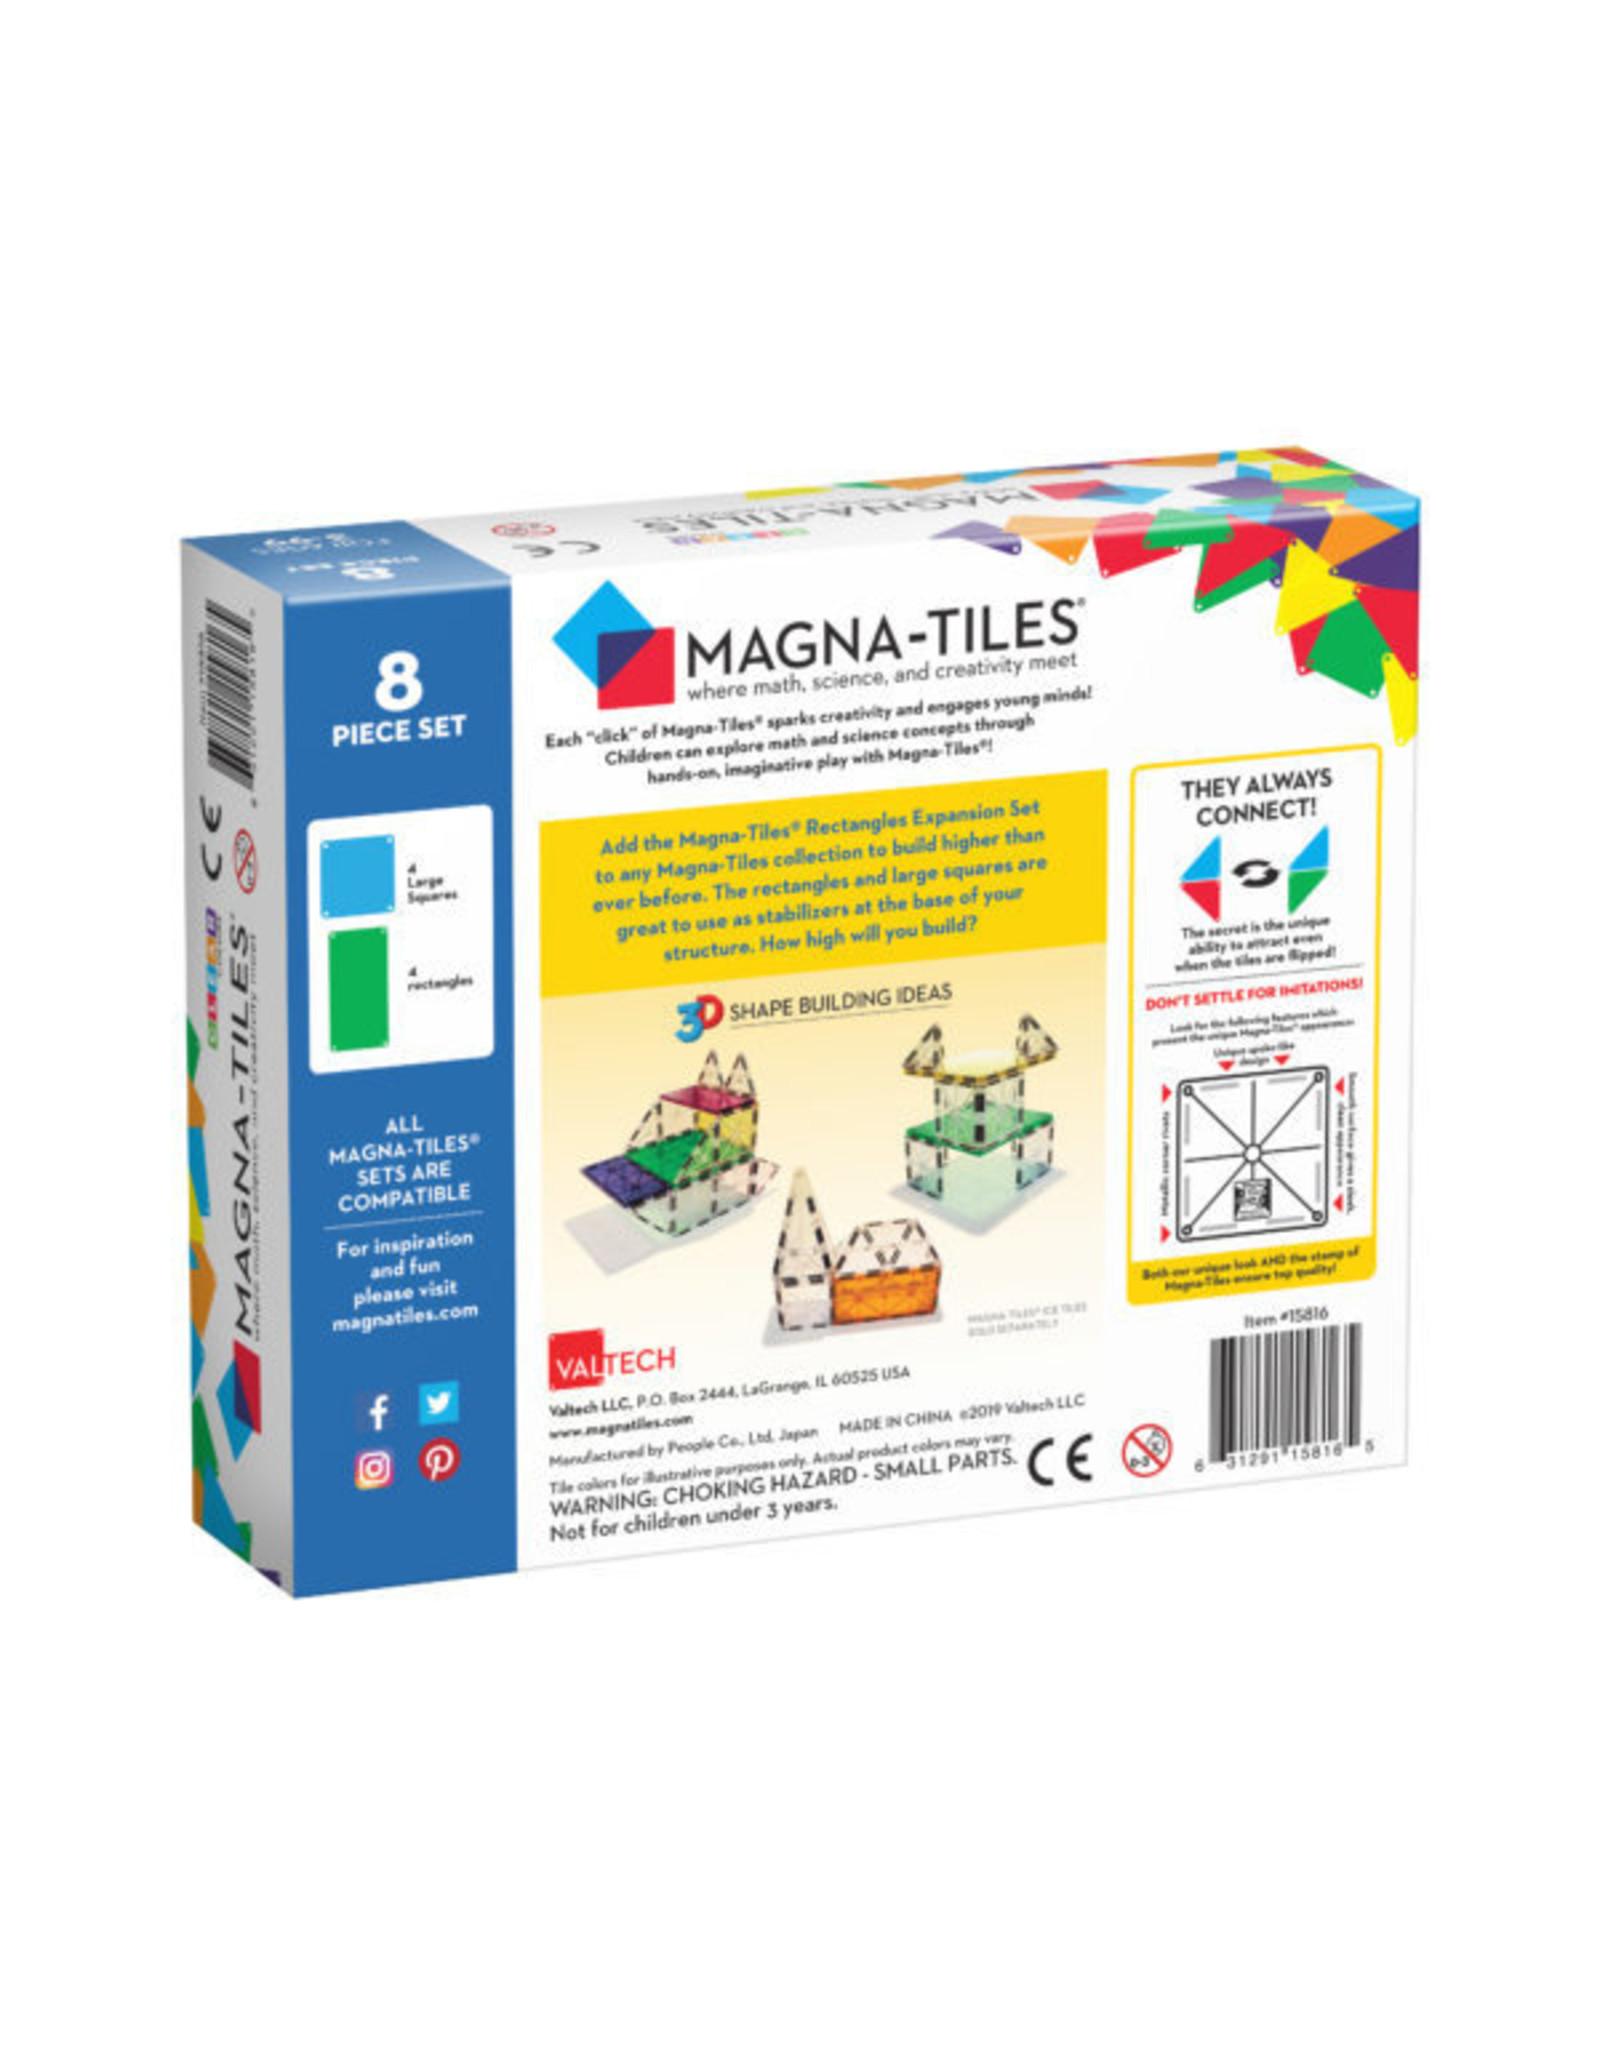 Magna-Tiles Magna-Tiles Rectangles 8 Piece Expansion Set